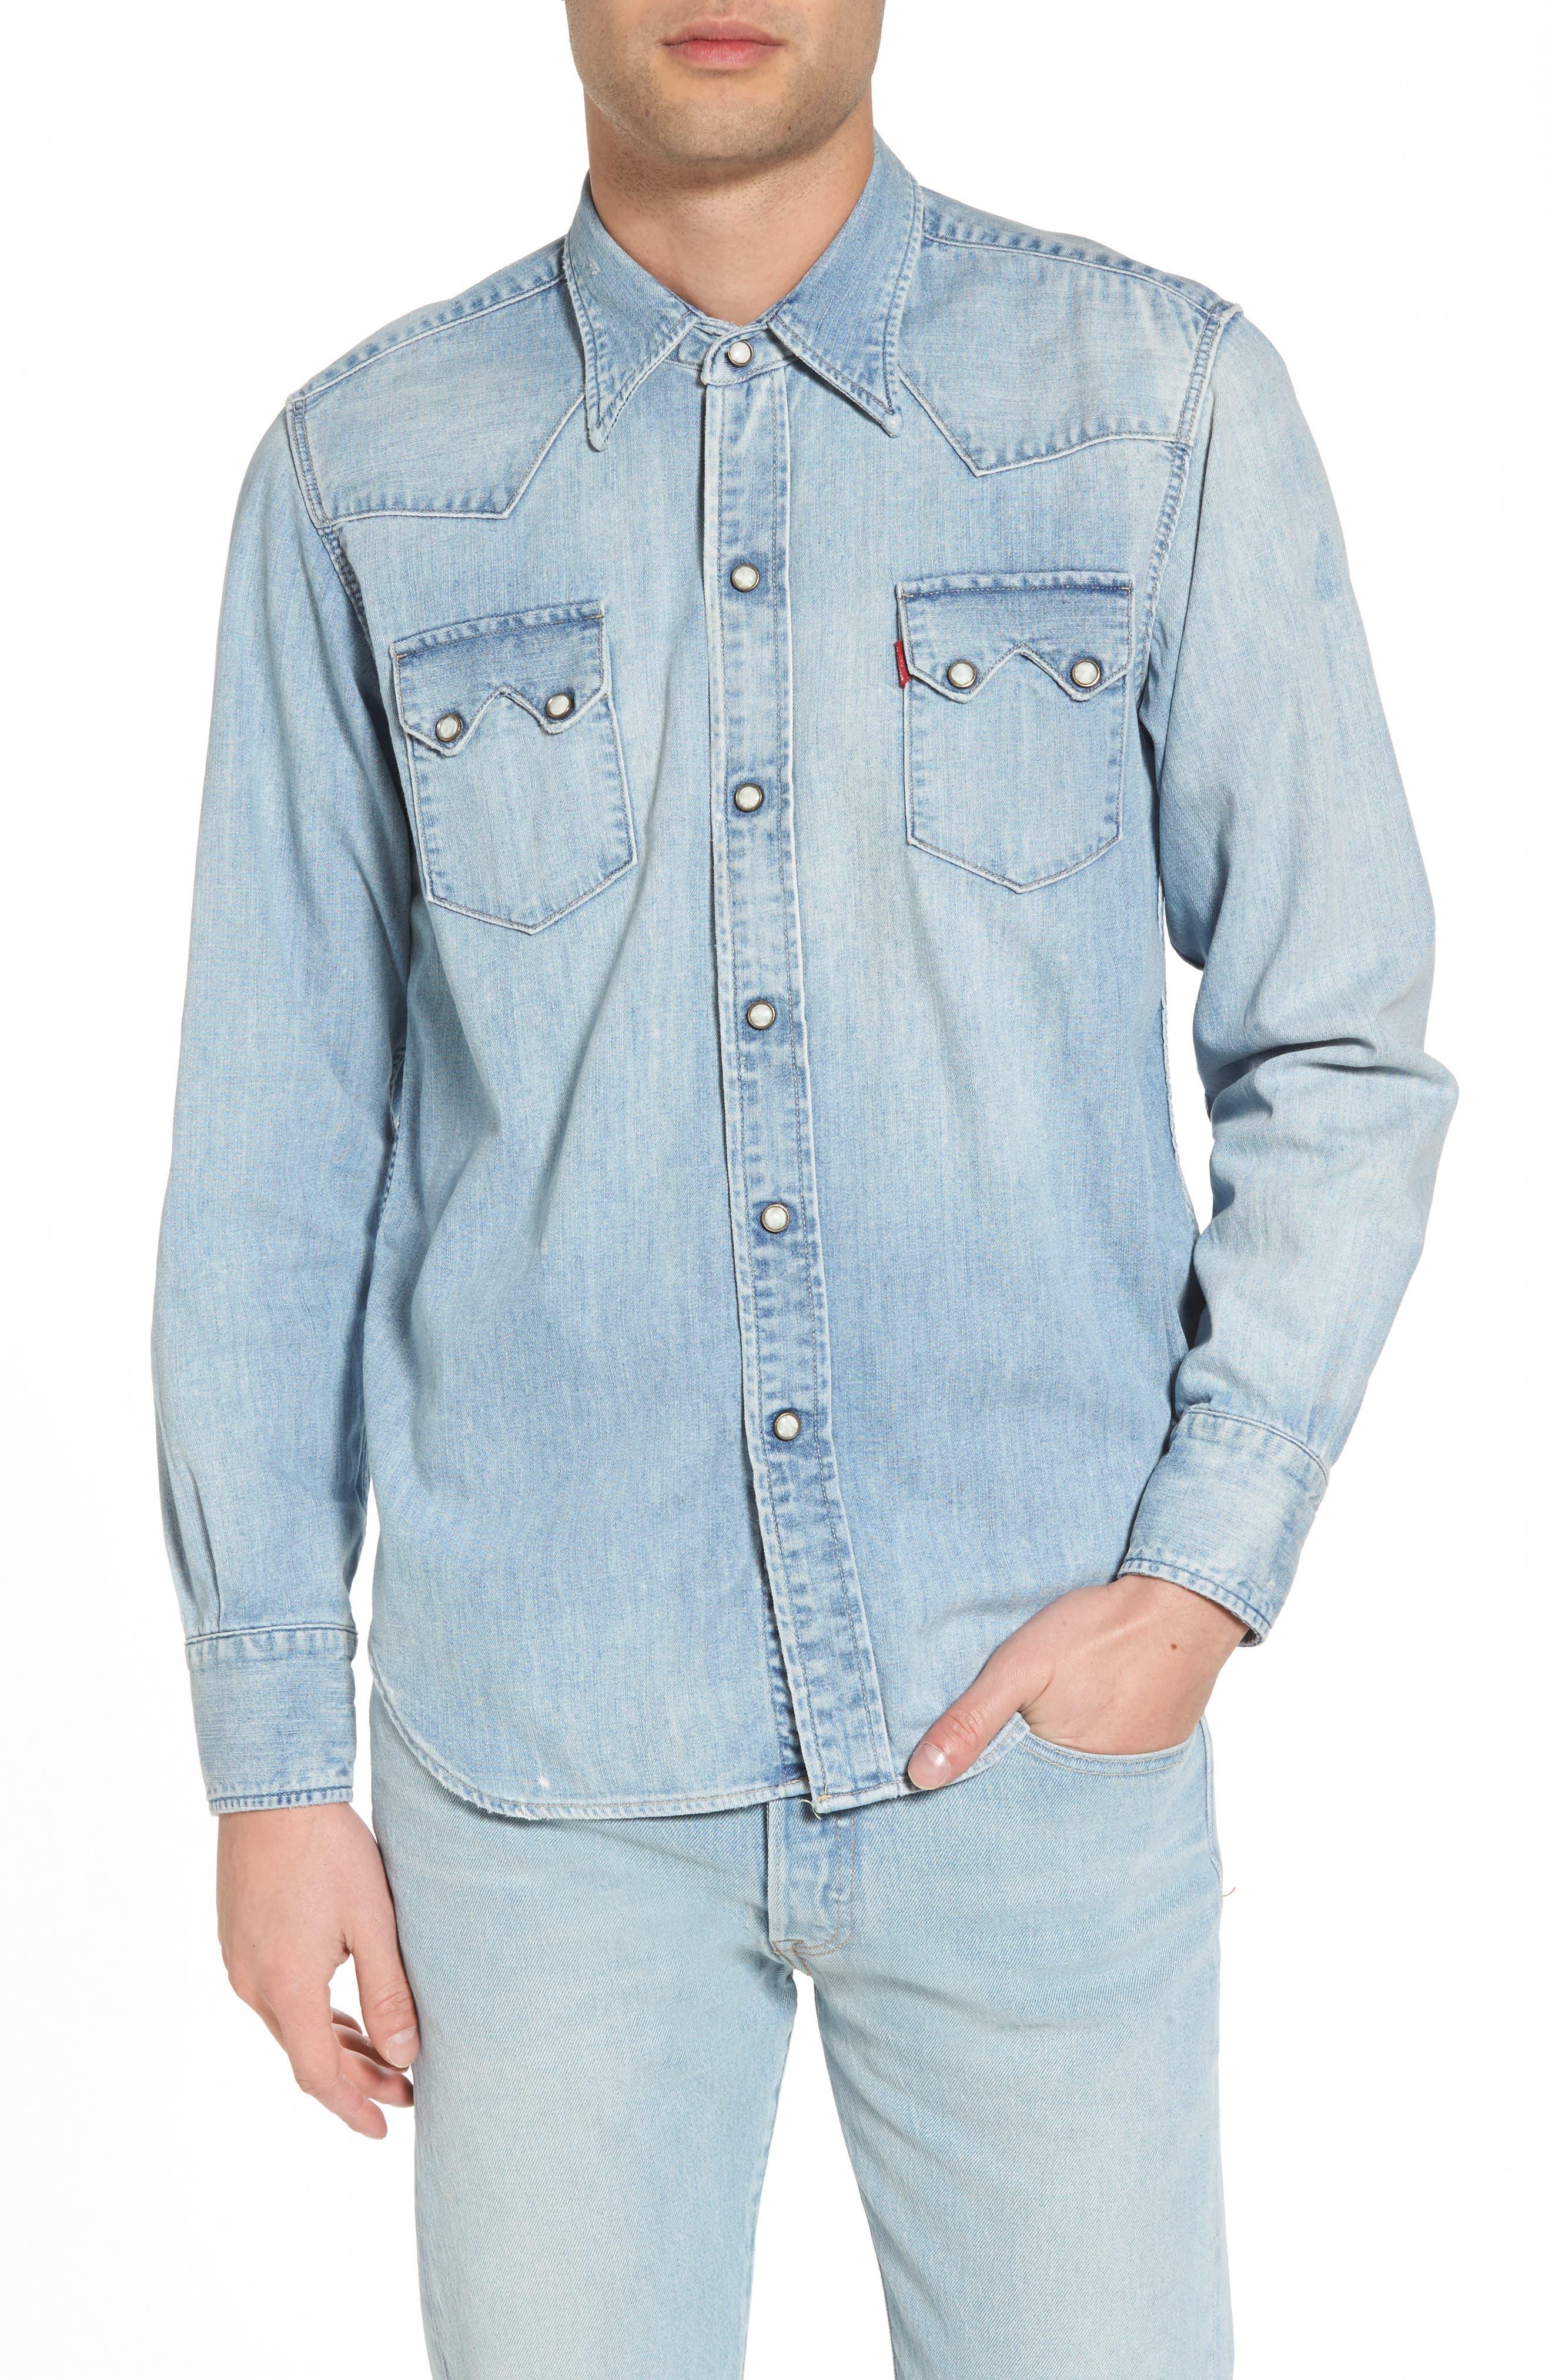 1955 Sawtooth Trim Fit Denim Western Shirt,                             Main thumbnail 1, color,                             Blue